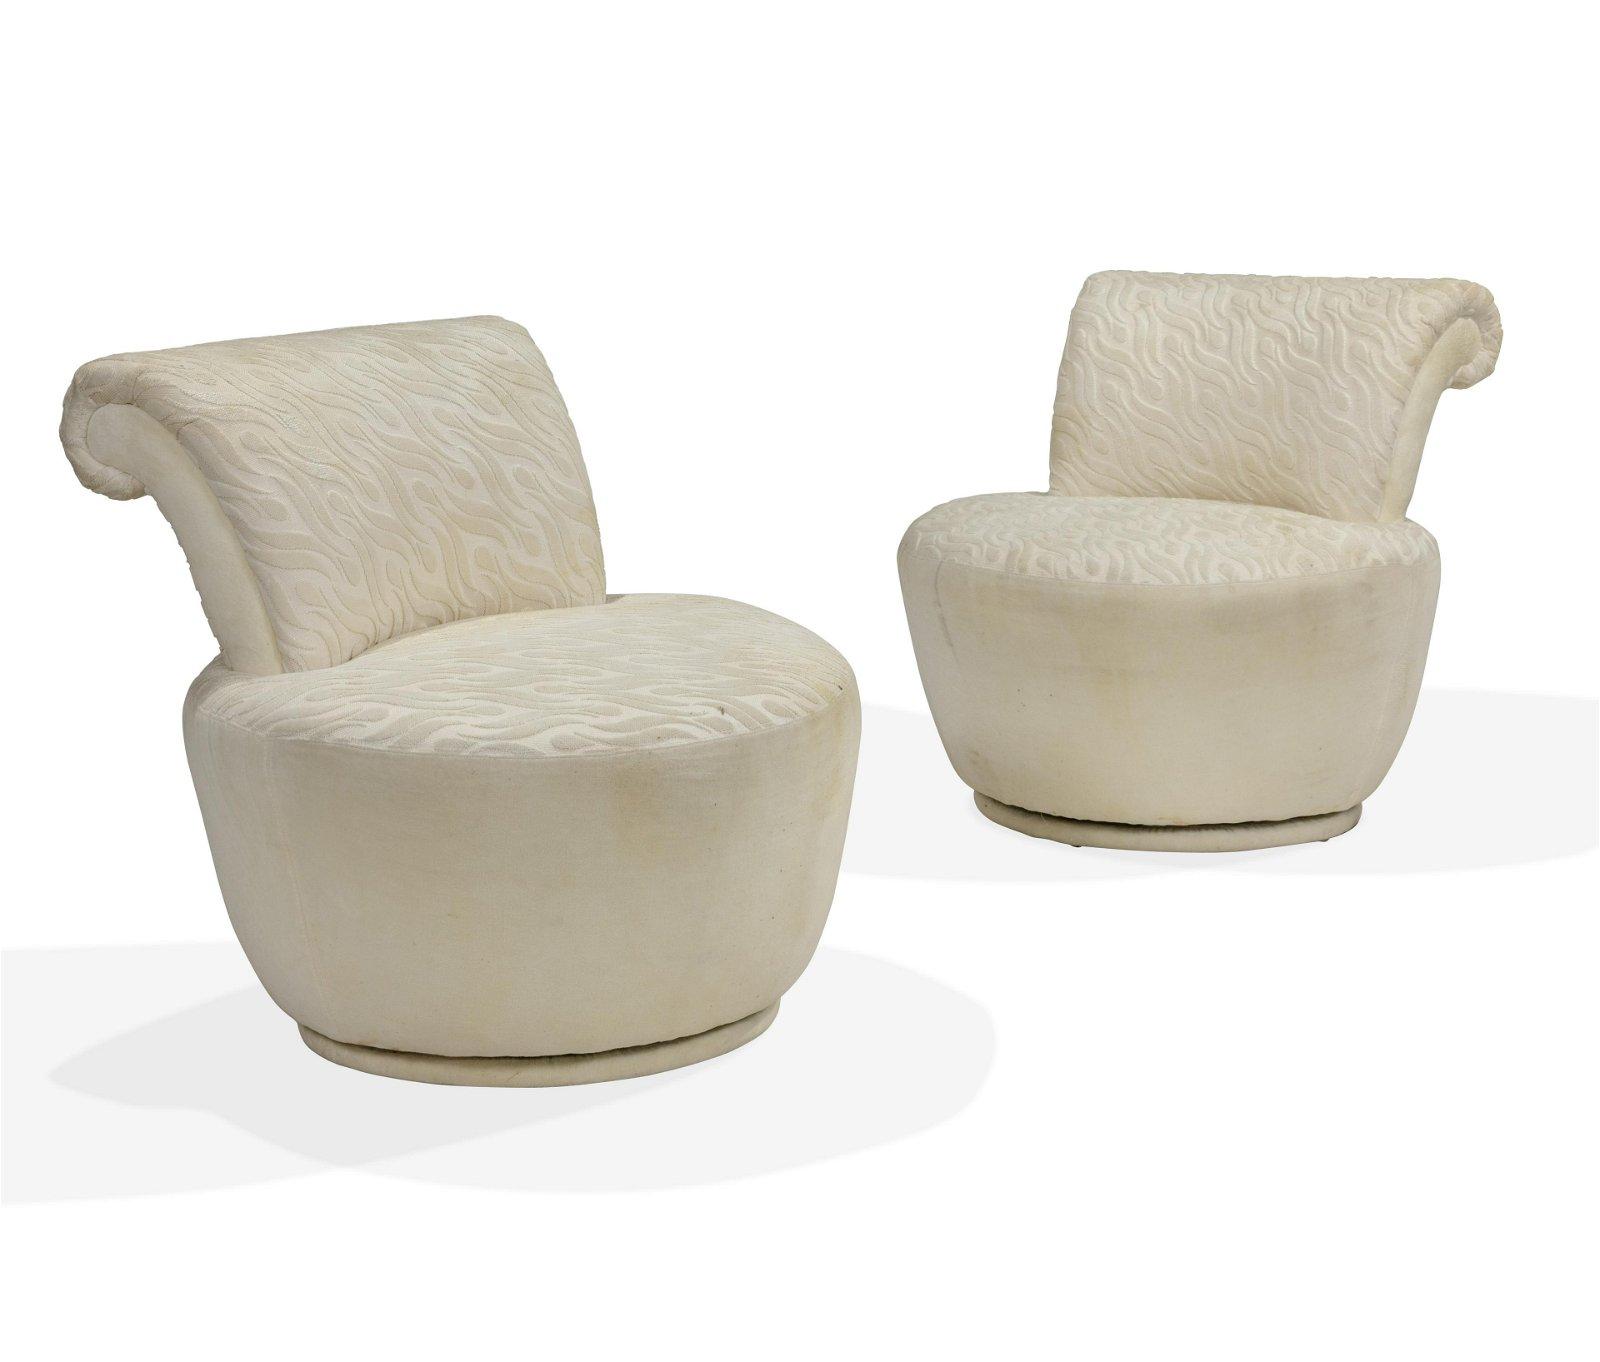 Vladimir Kagan (Attr.) Weiman Pouf Swivel Chairs